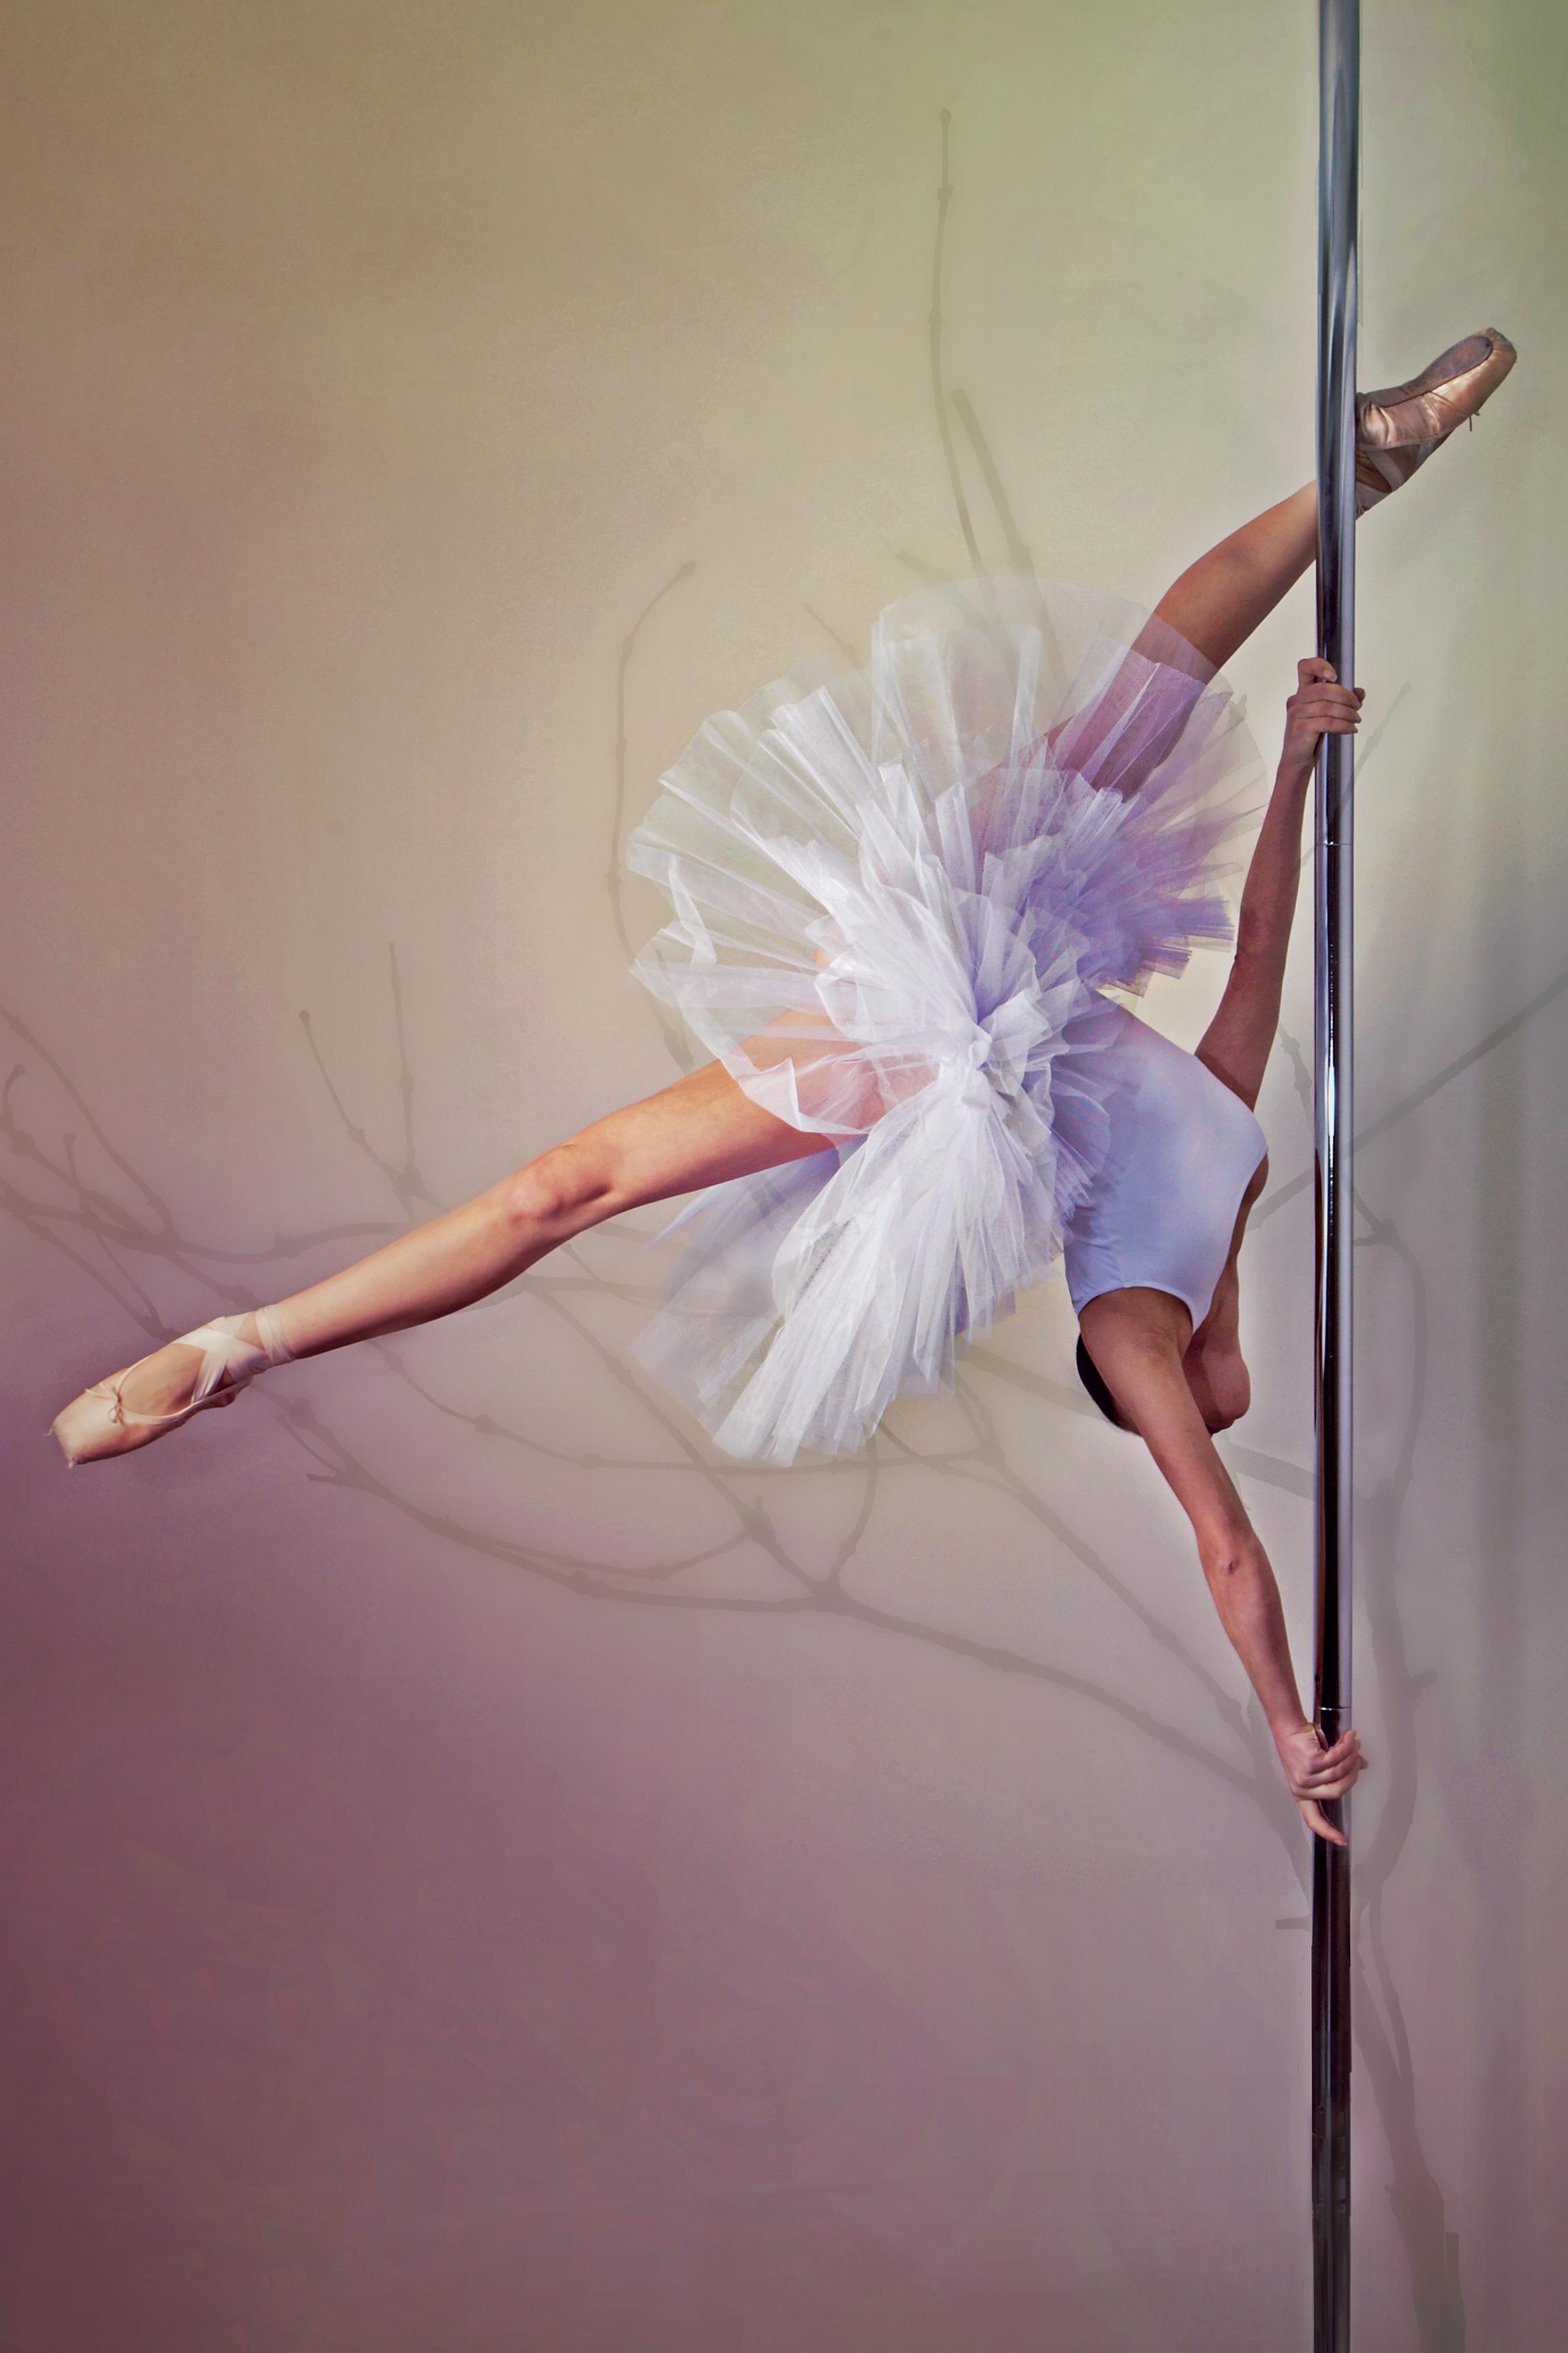 Танцовщица в чешках 9 фотография